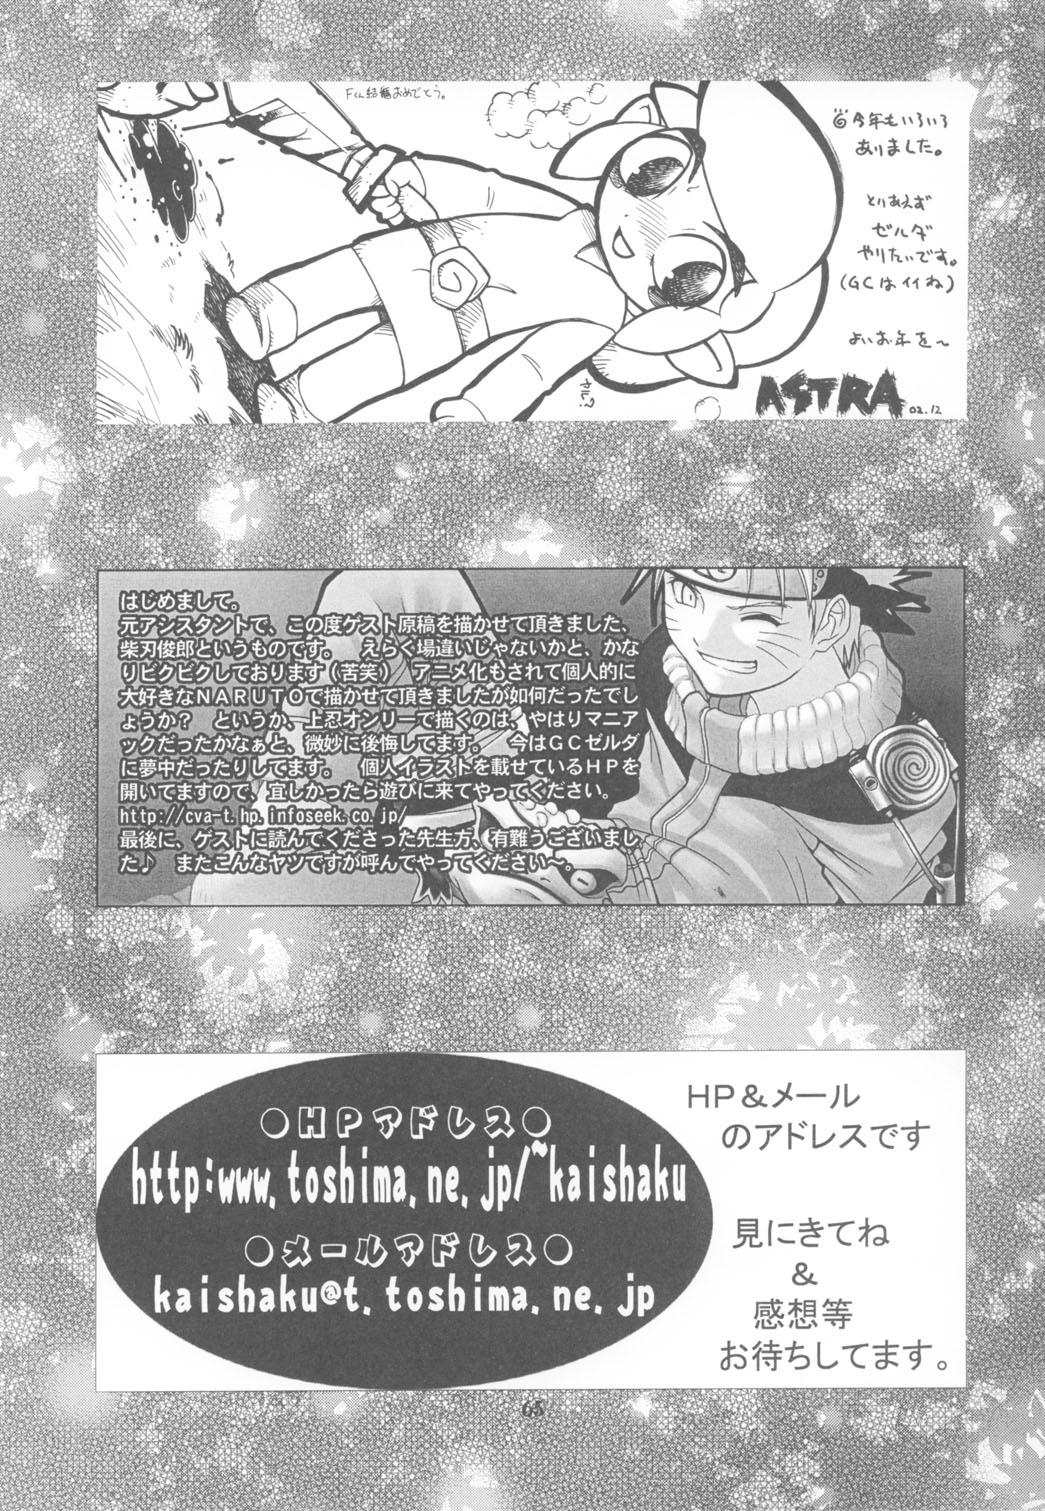 KAISHAKU RAGUNAROK ONLINE 64